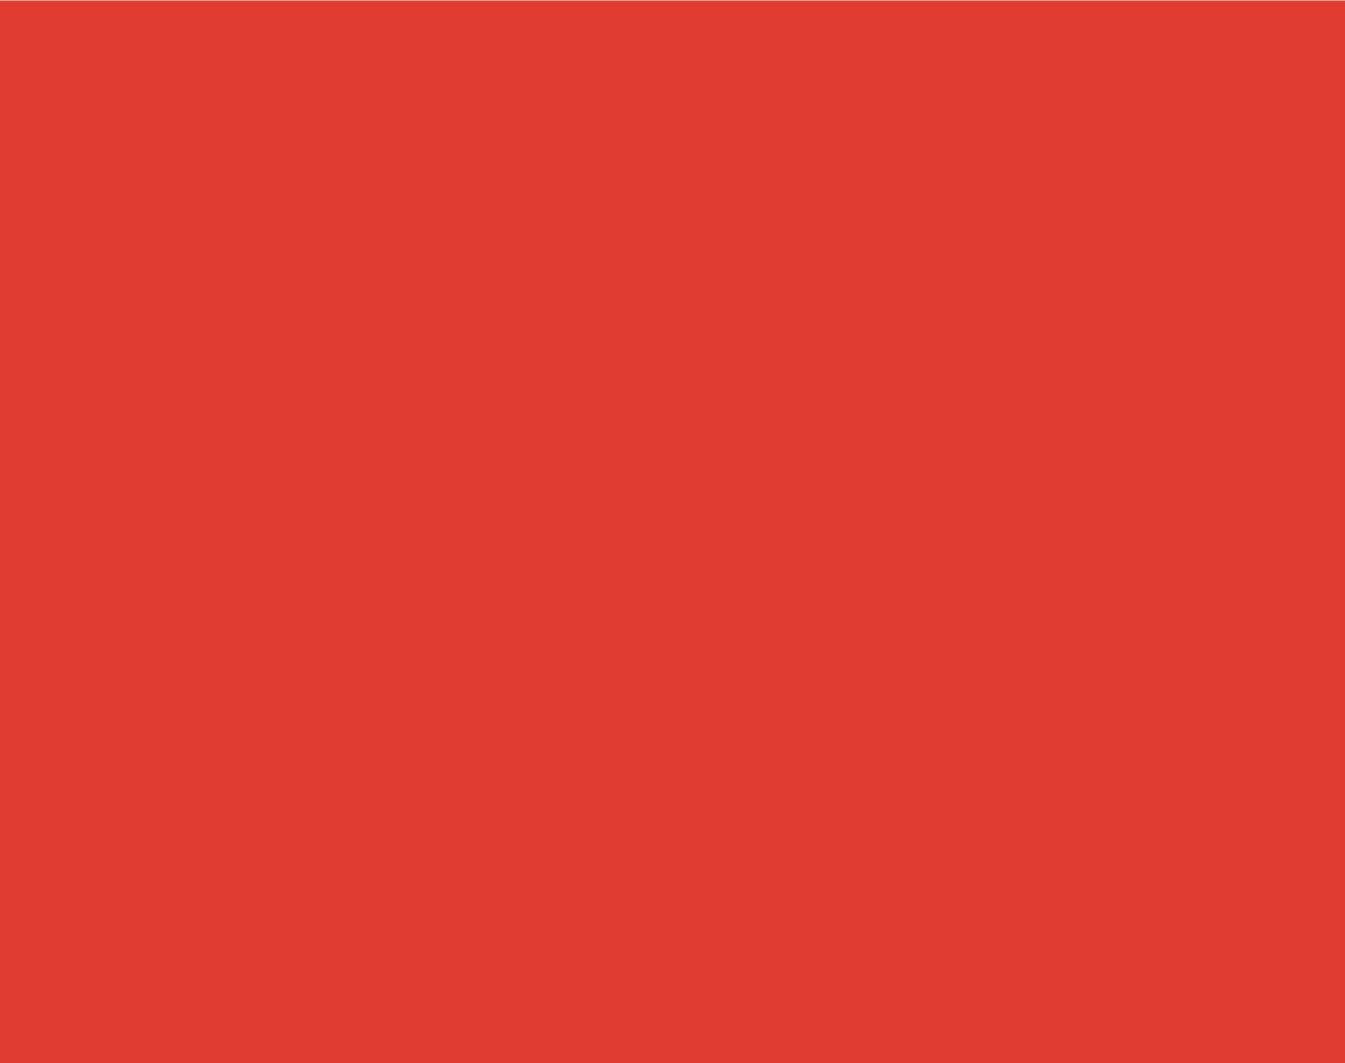 Pantone  179 C  CMYK: 0 / 87 / 85 / 0  RGB: 224 / 60 / 49  Hex: #E03C31